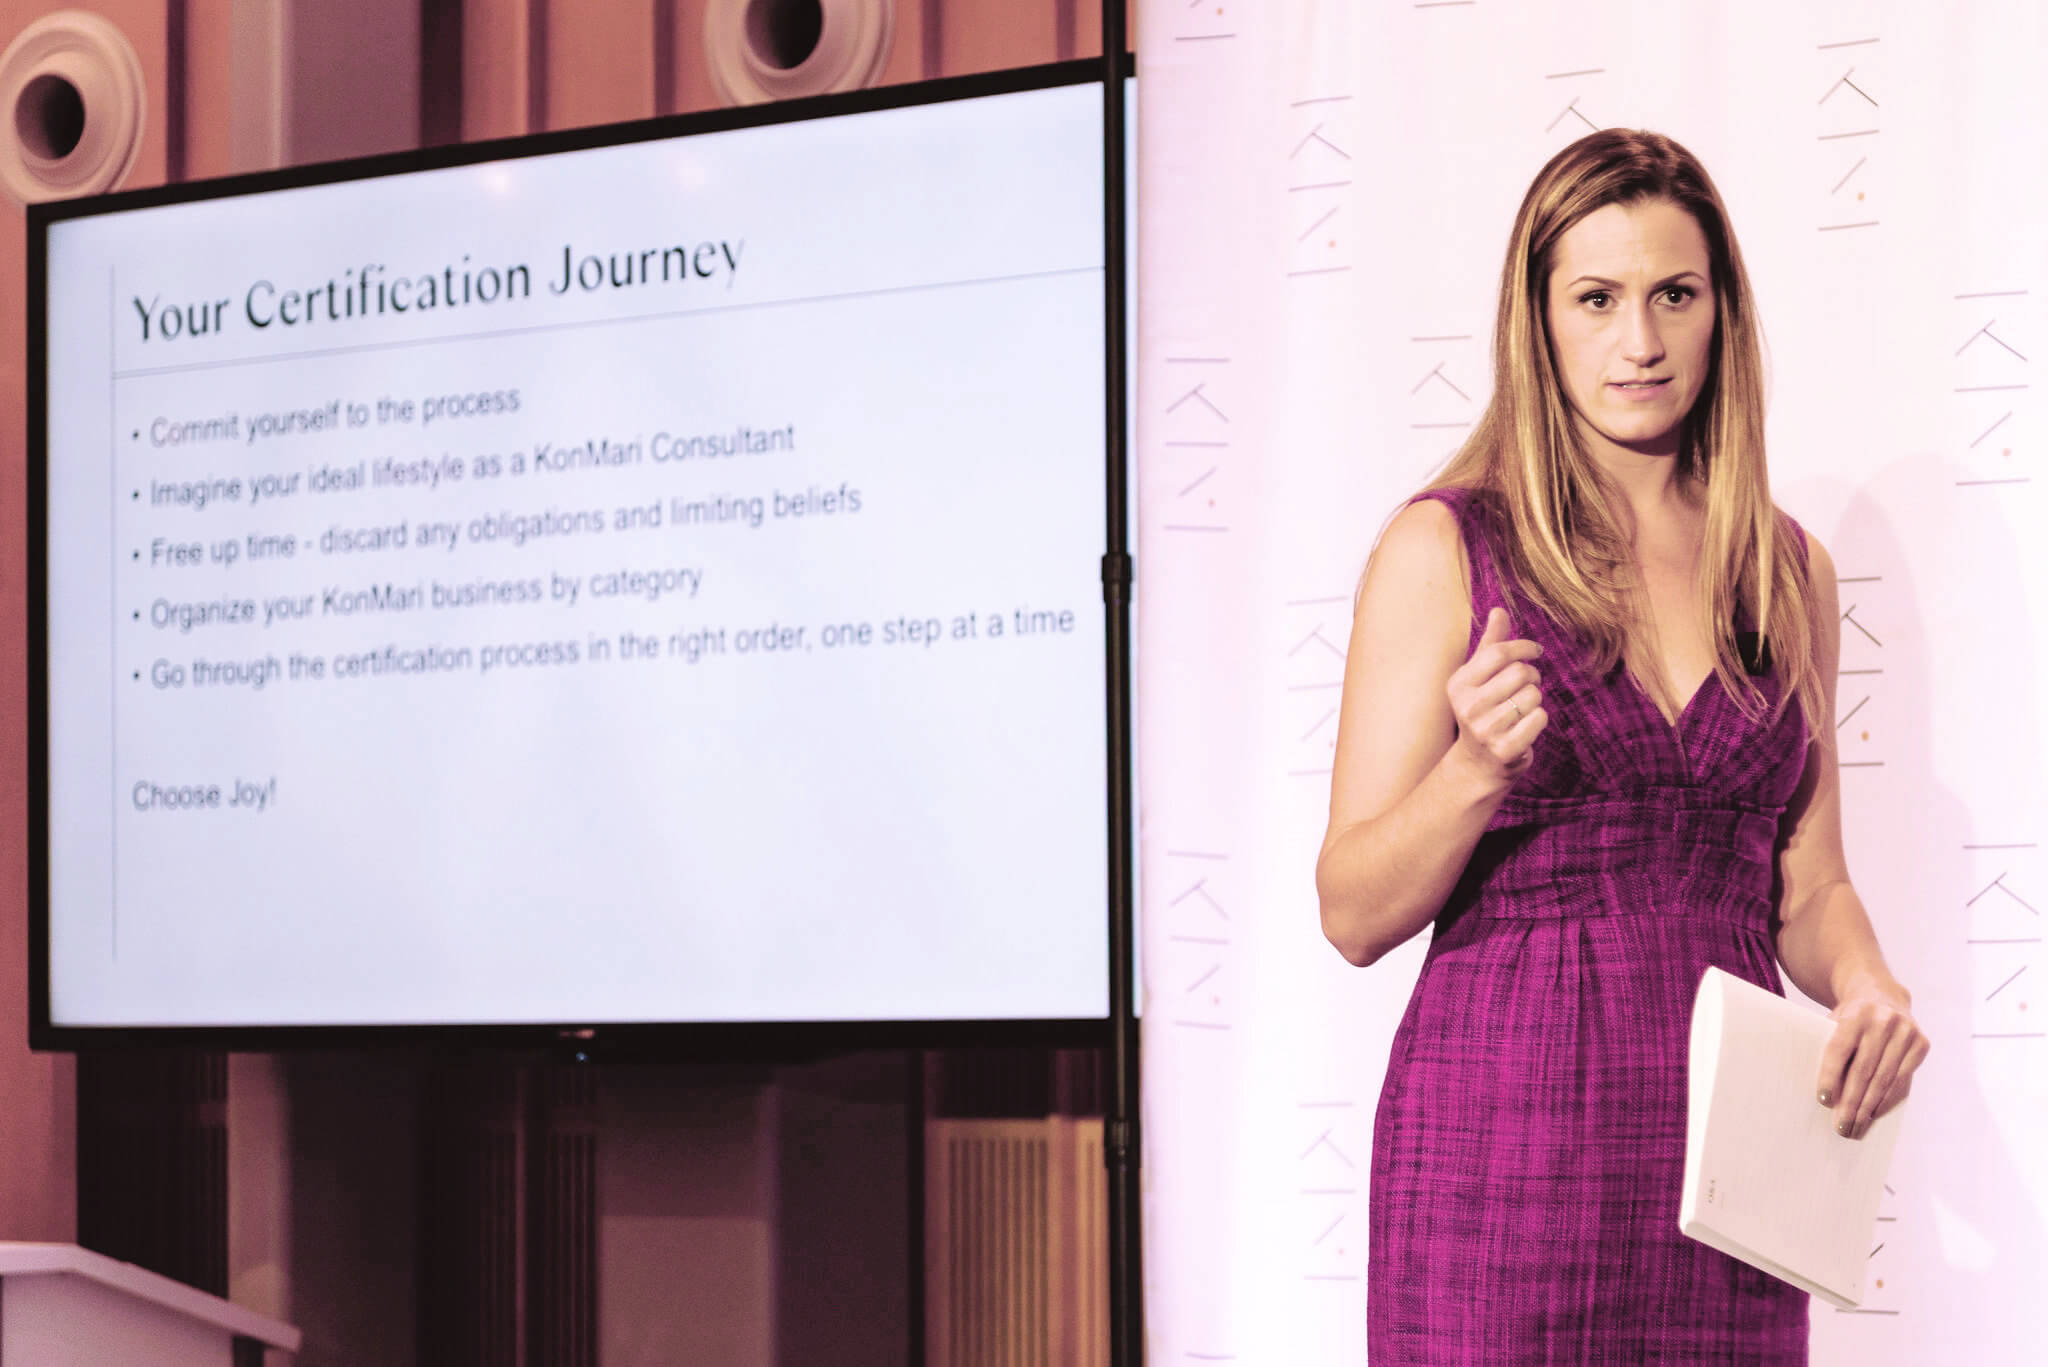 KonMari Team Leader, Patty Morrissey, The KonMari Consultant Certification Course in New York, November 2019